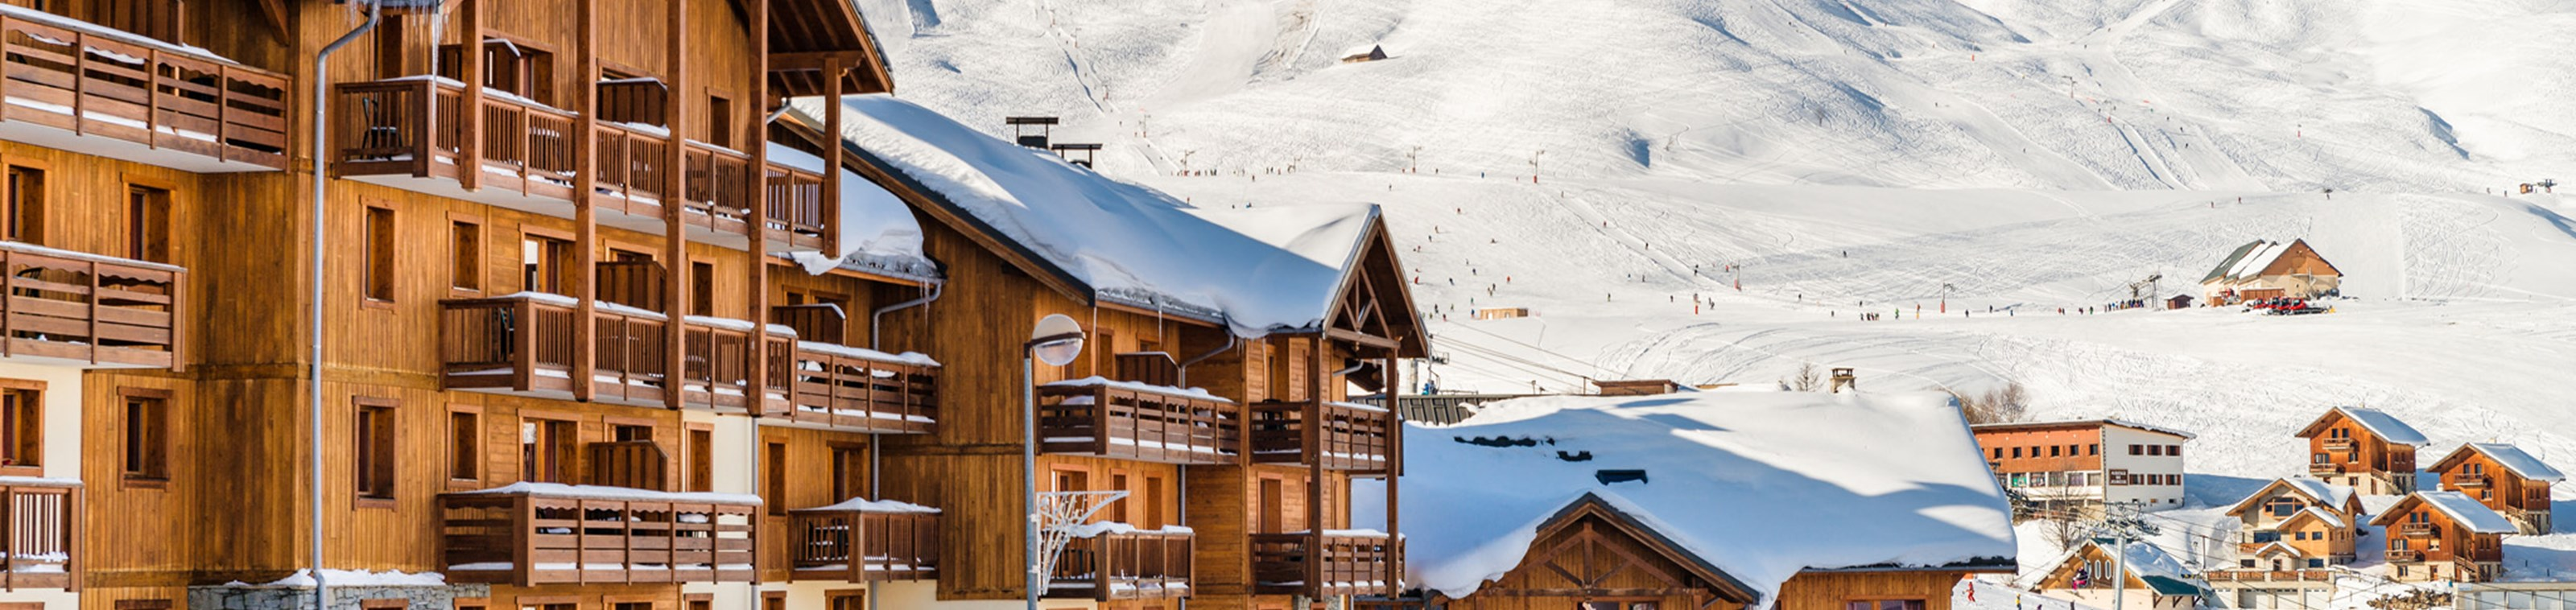 Wintervakantie in la Toussuire